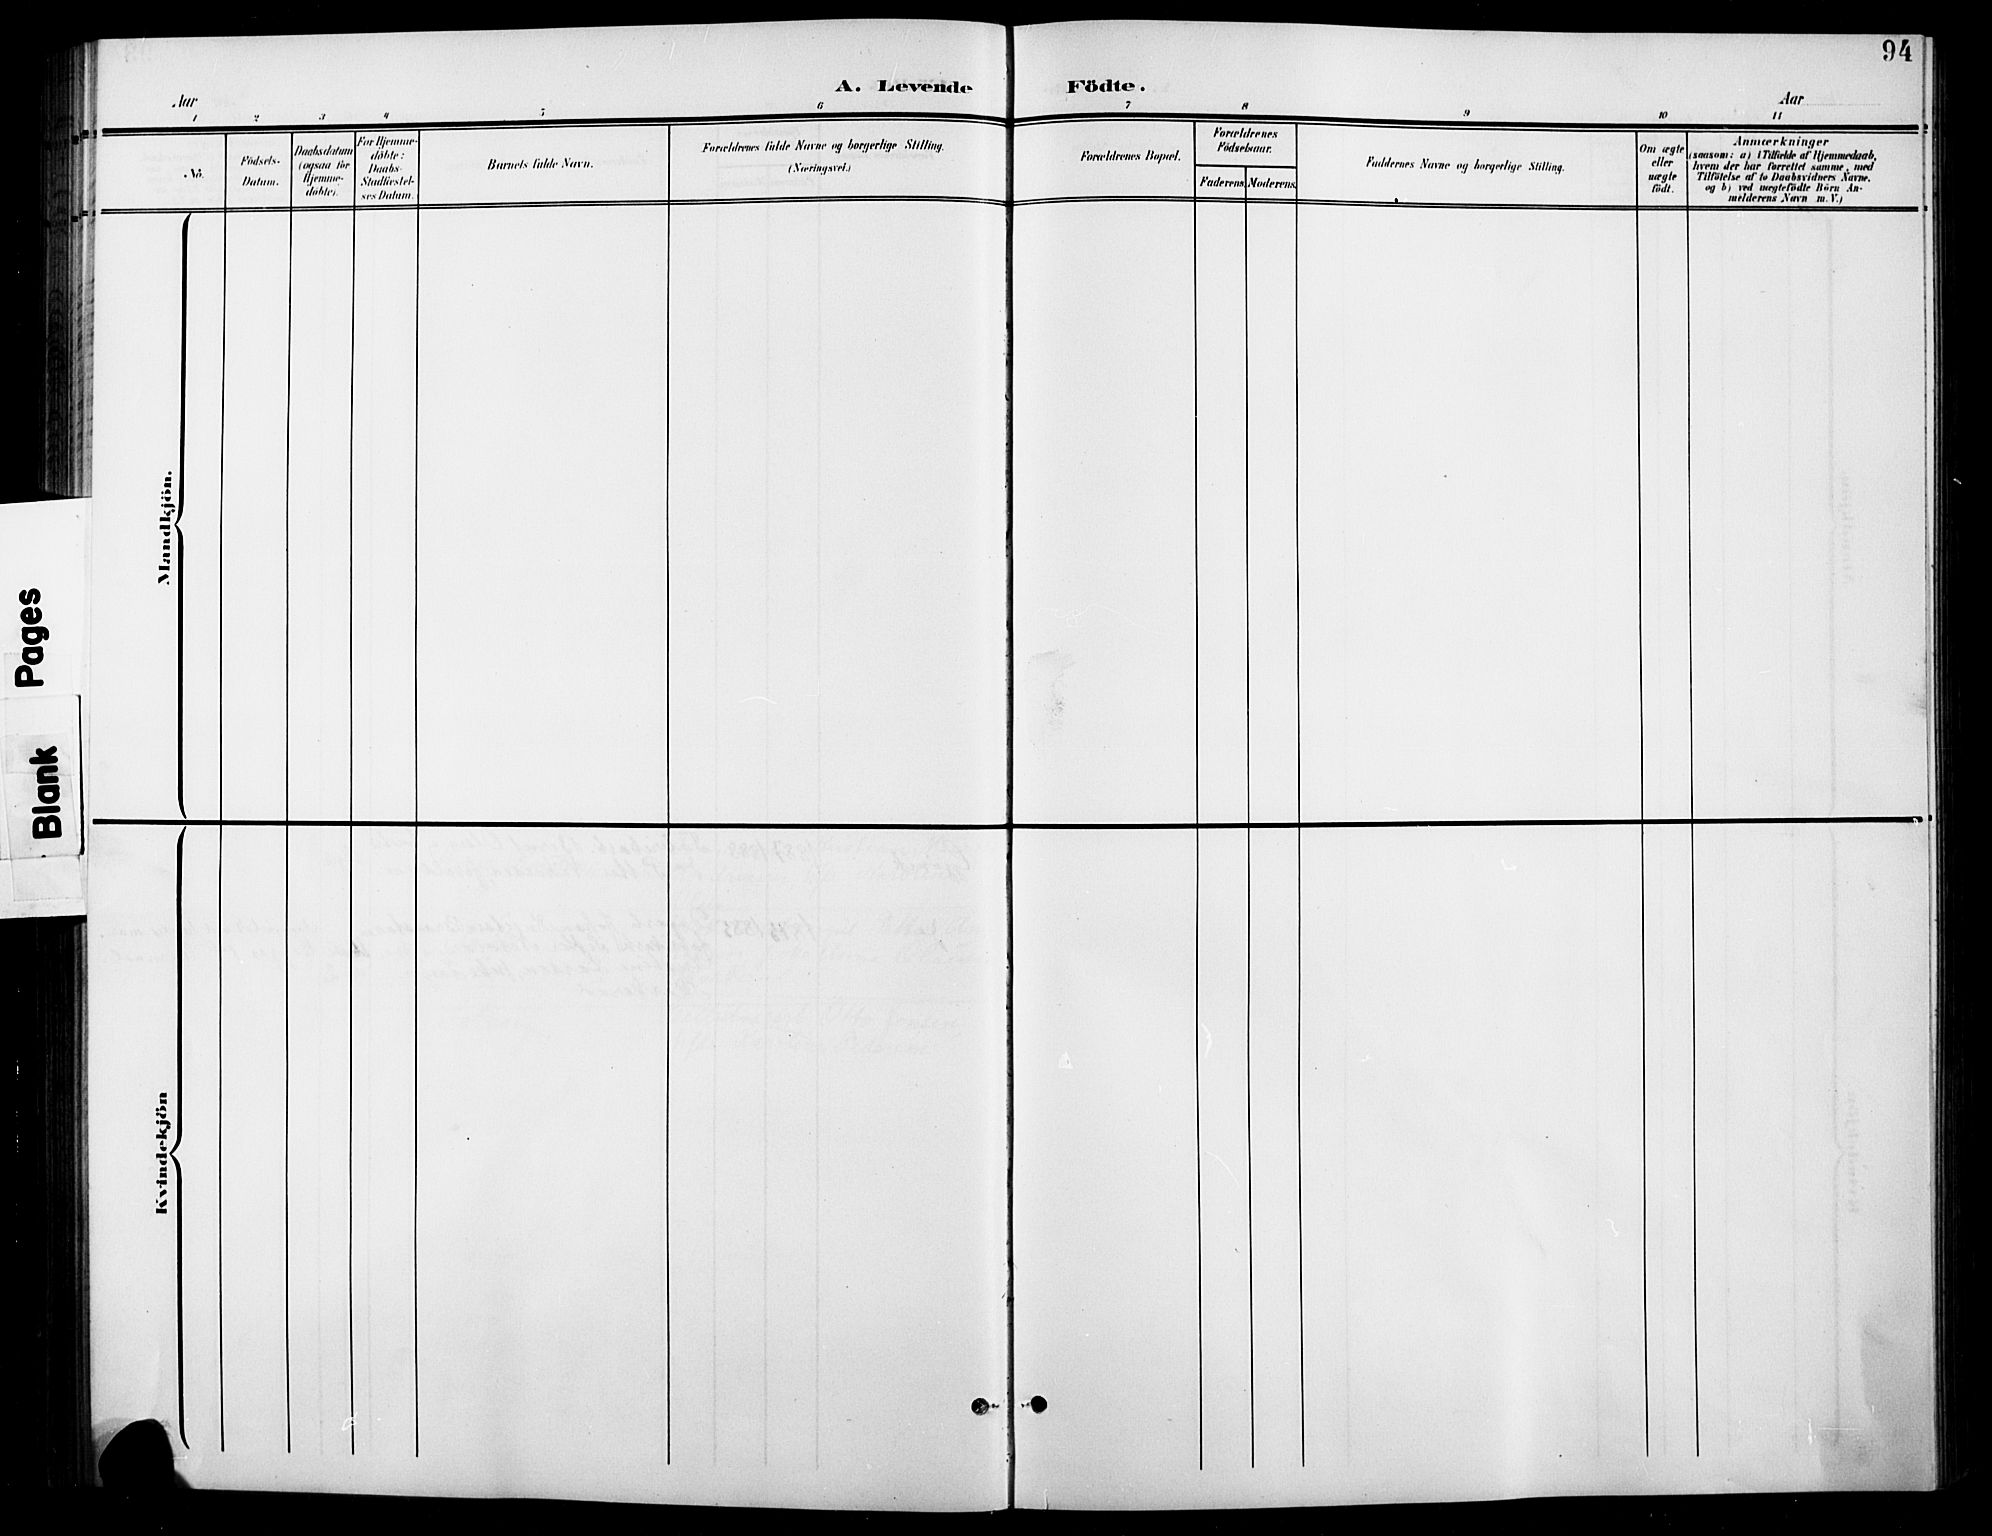 SAH, Vardal prestekontor, H/Ha/Hab/L0012: Klokkerbok nr. 12, 1902-1911, s. 94